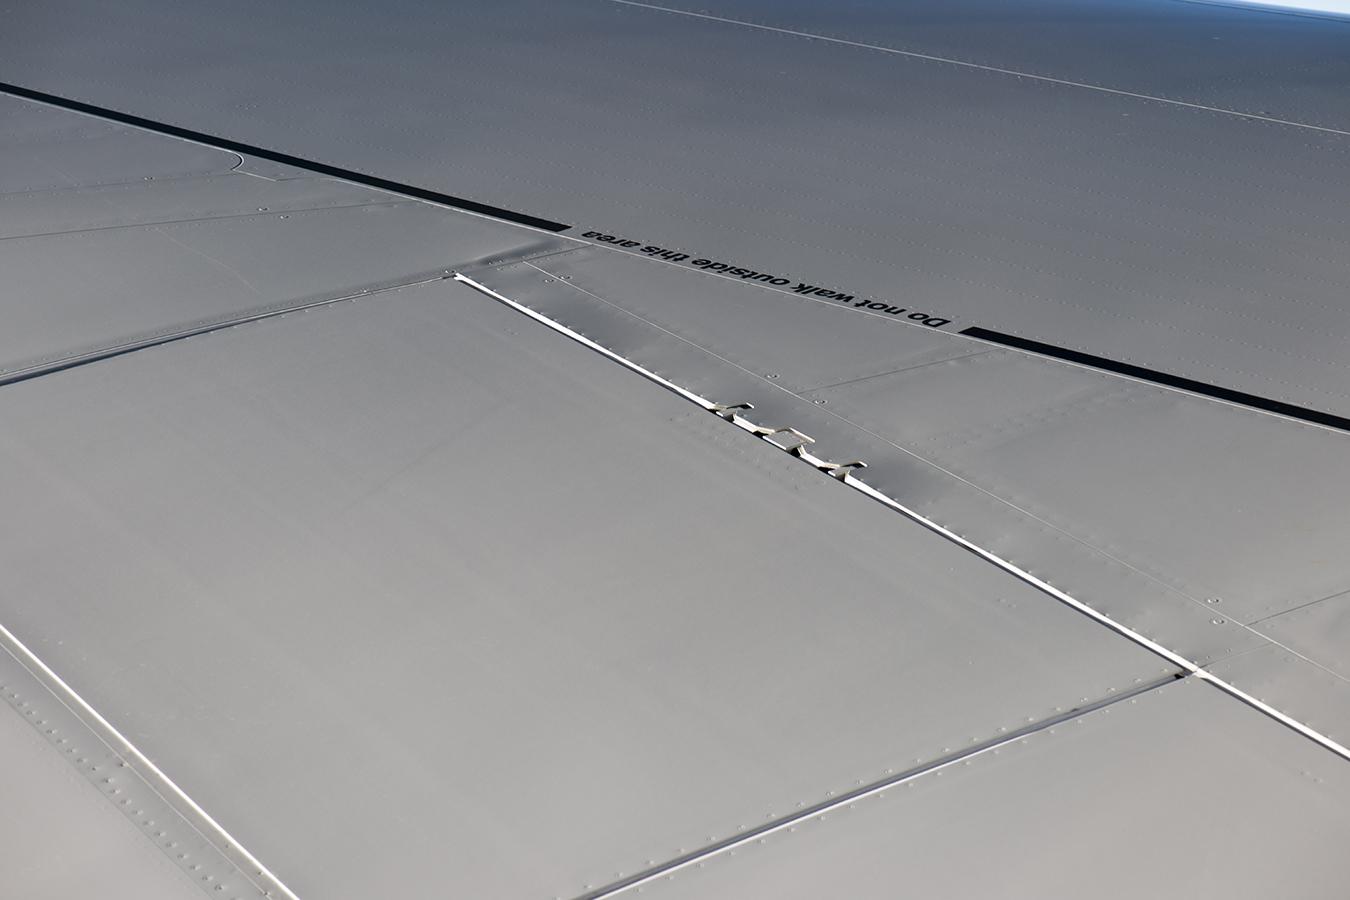 YT Wing detail (1 of 1) original.jpg